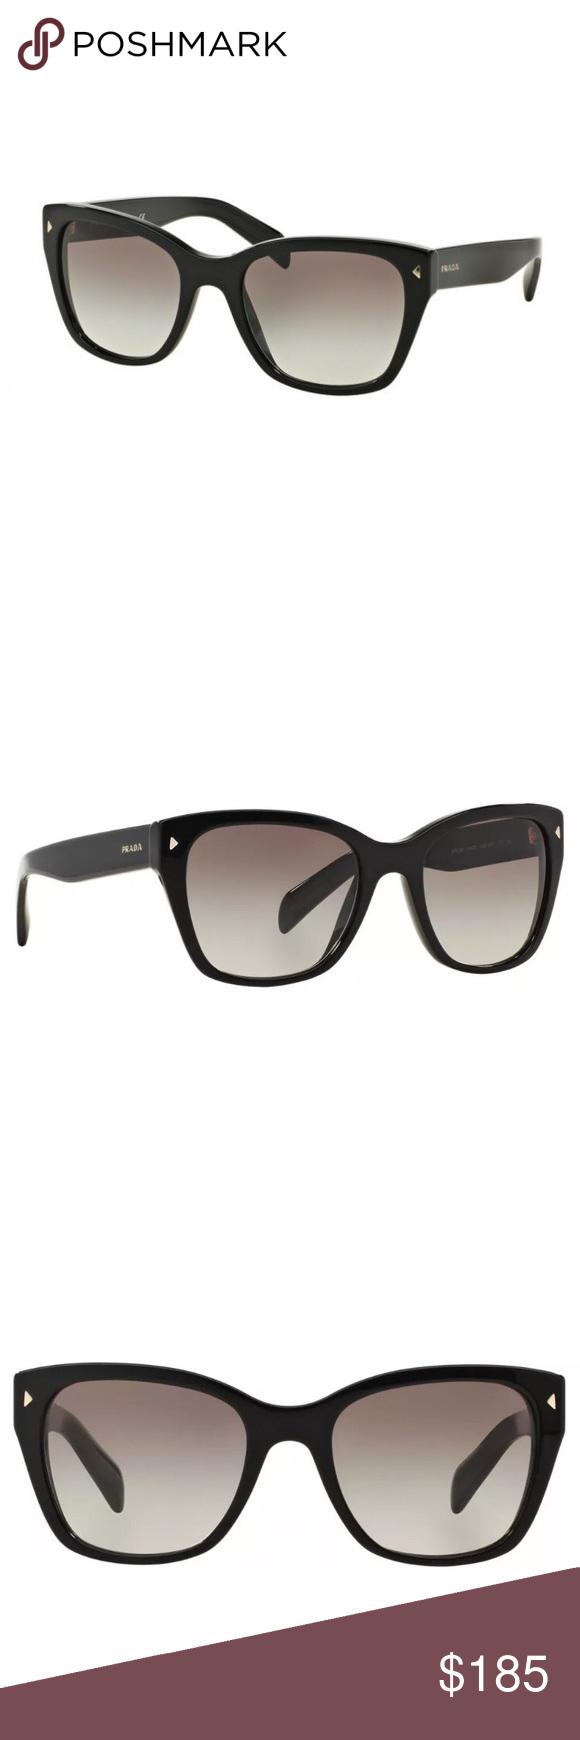 Sunglasses - PR 0PR 09SS 54 1AB0A7 - black - Sunglasses for ladies Prada AIy0dihU